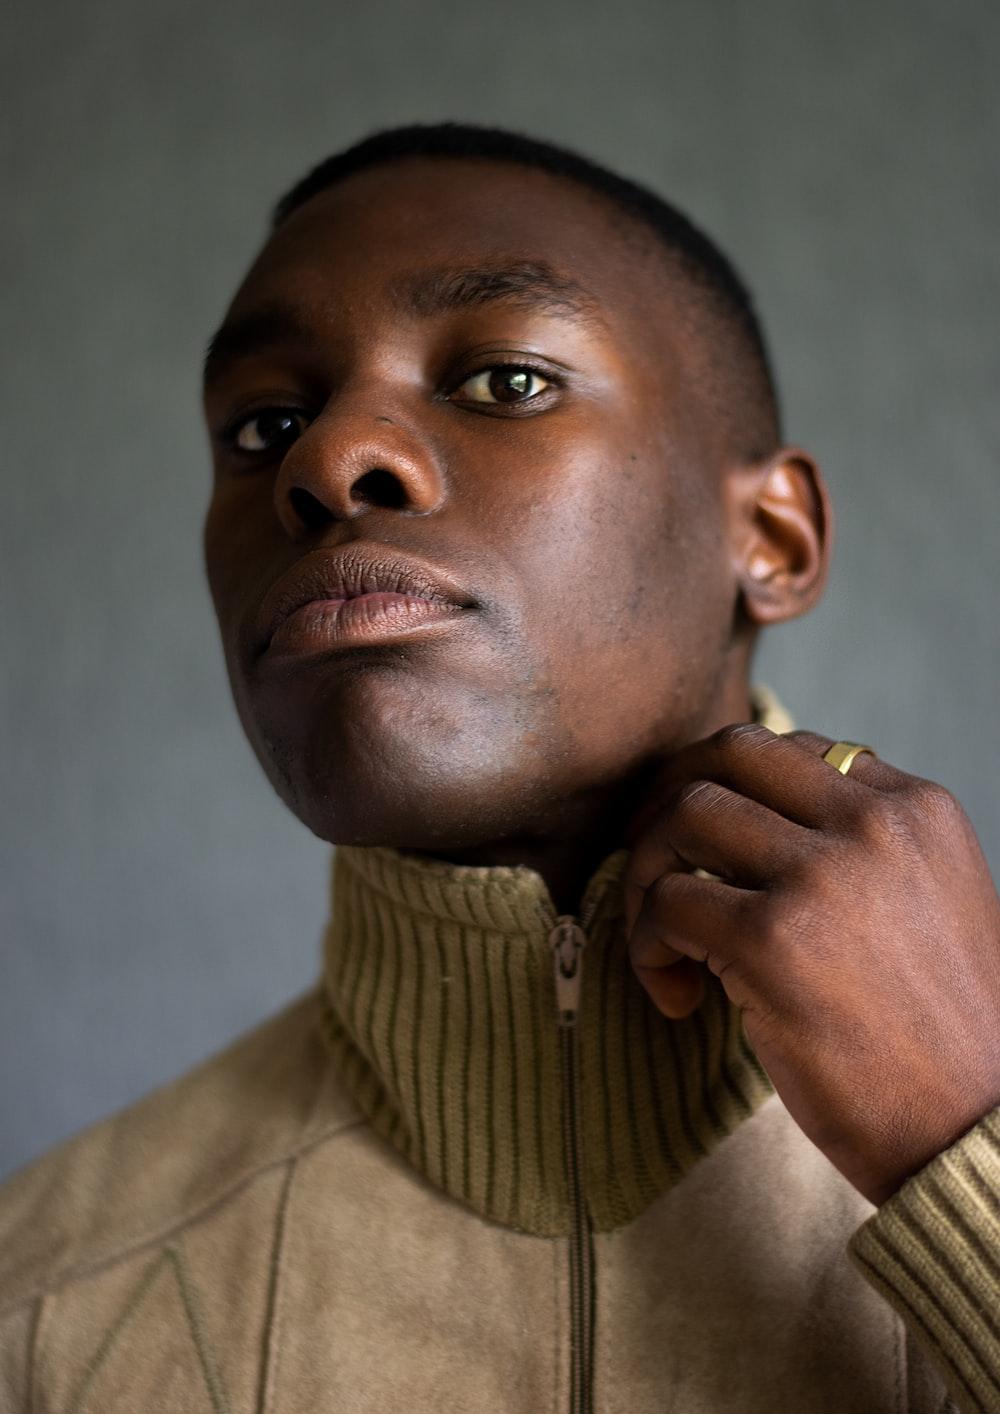 man in brown button up shirt